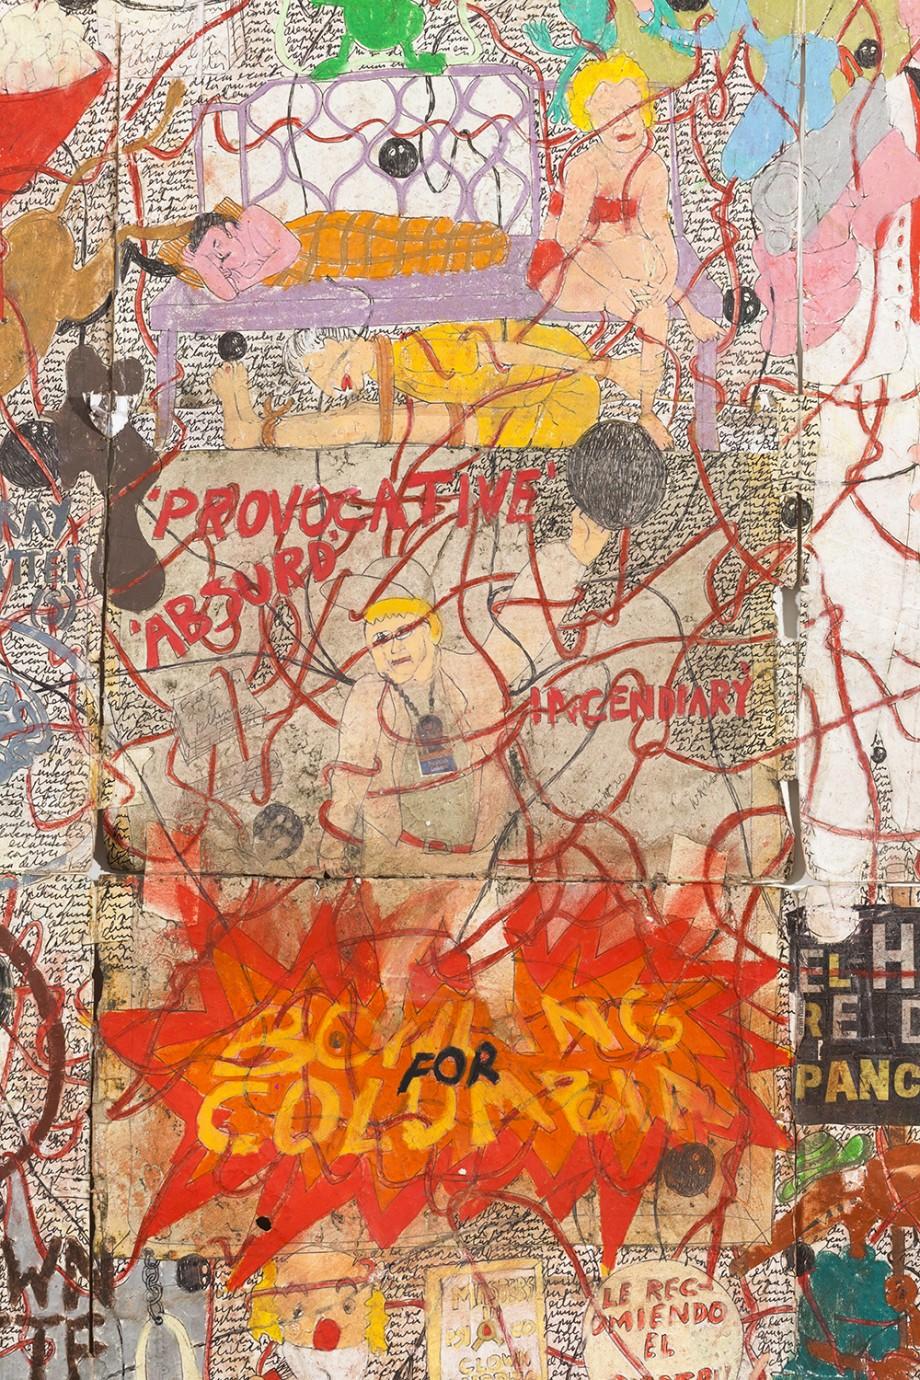 Camilo Restrepo, Steve Turner, Contemporary art, space program